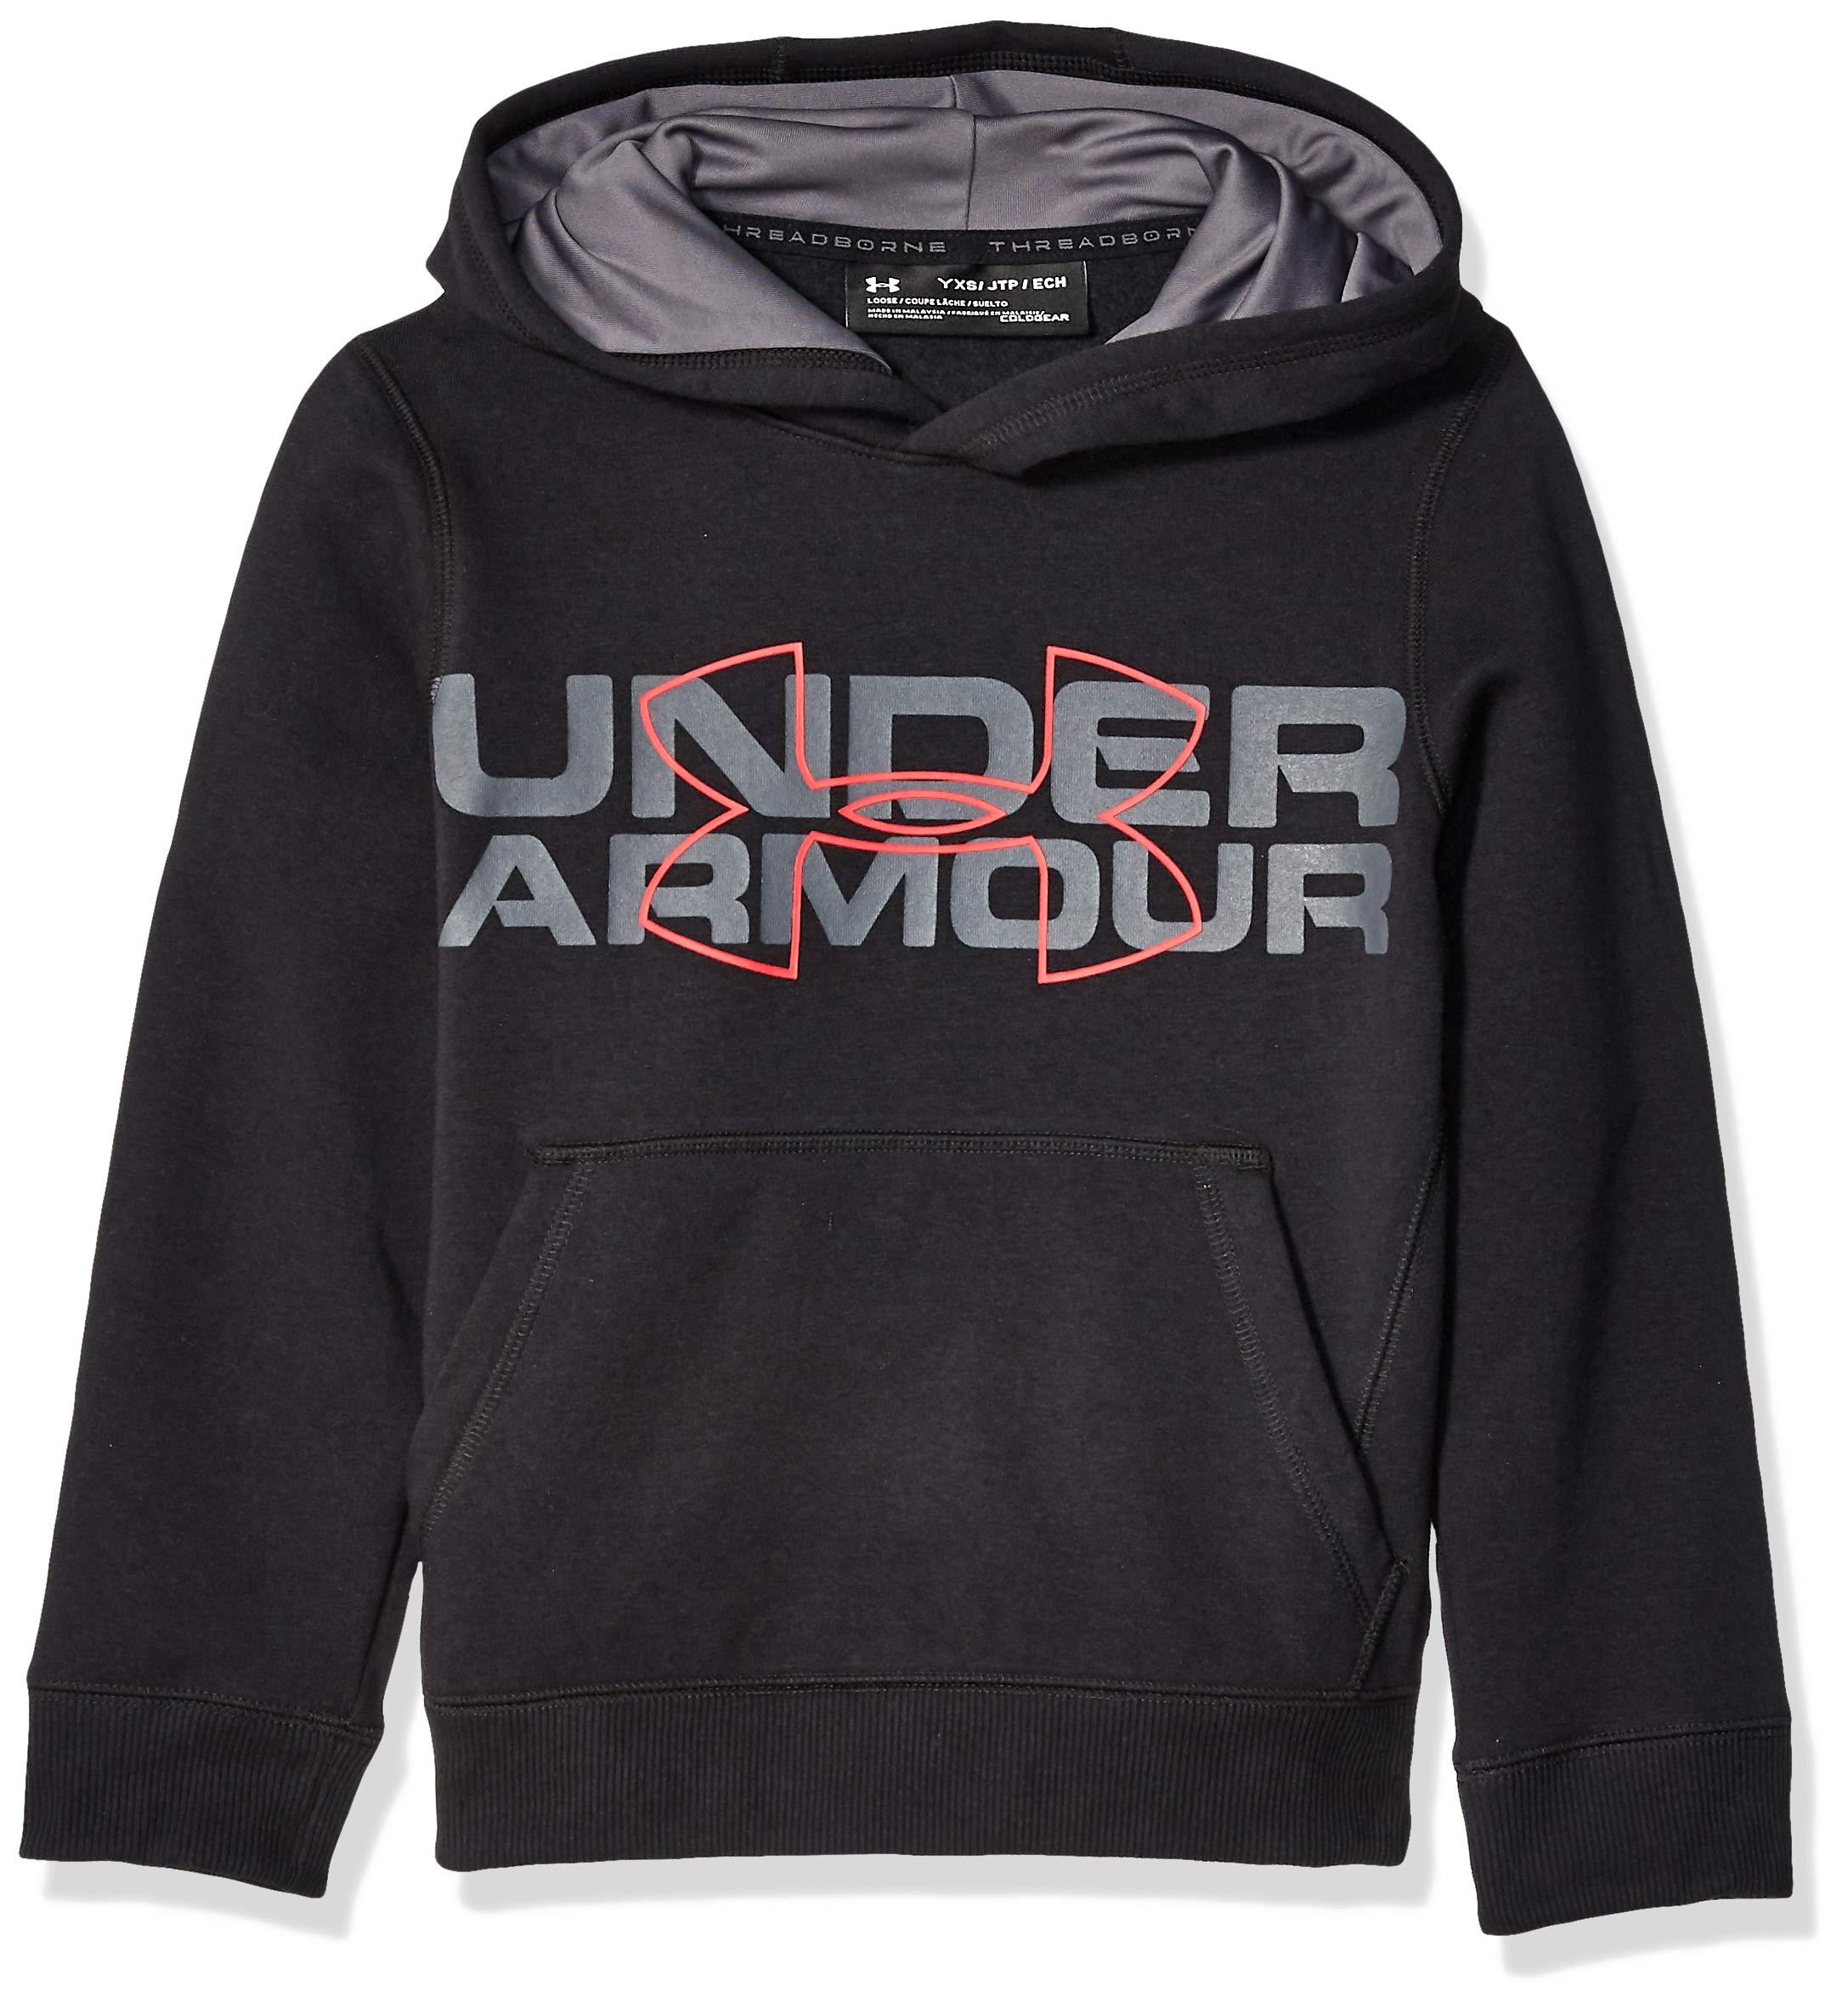 Under Armour Boys' Threadborne Logo Hoodie, Black /Red, Youth X-Small by Under Armour